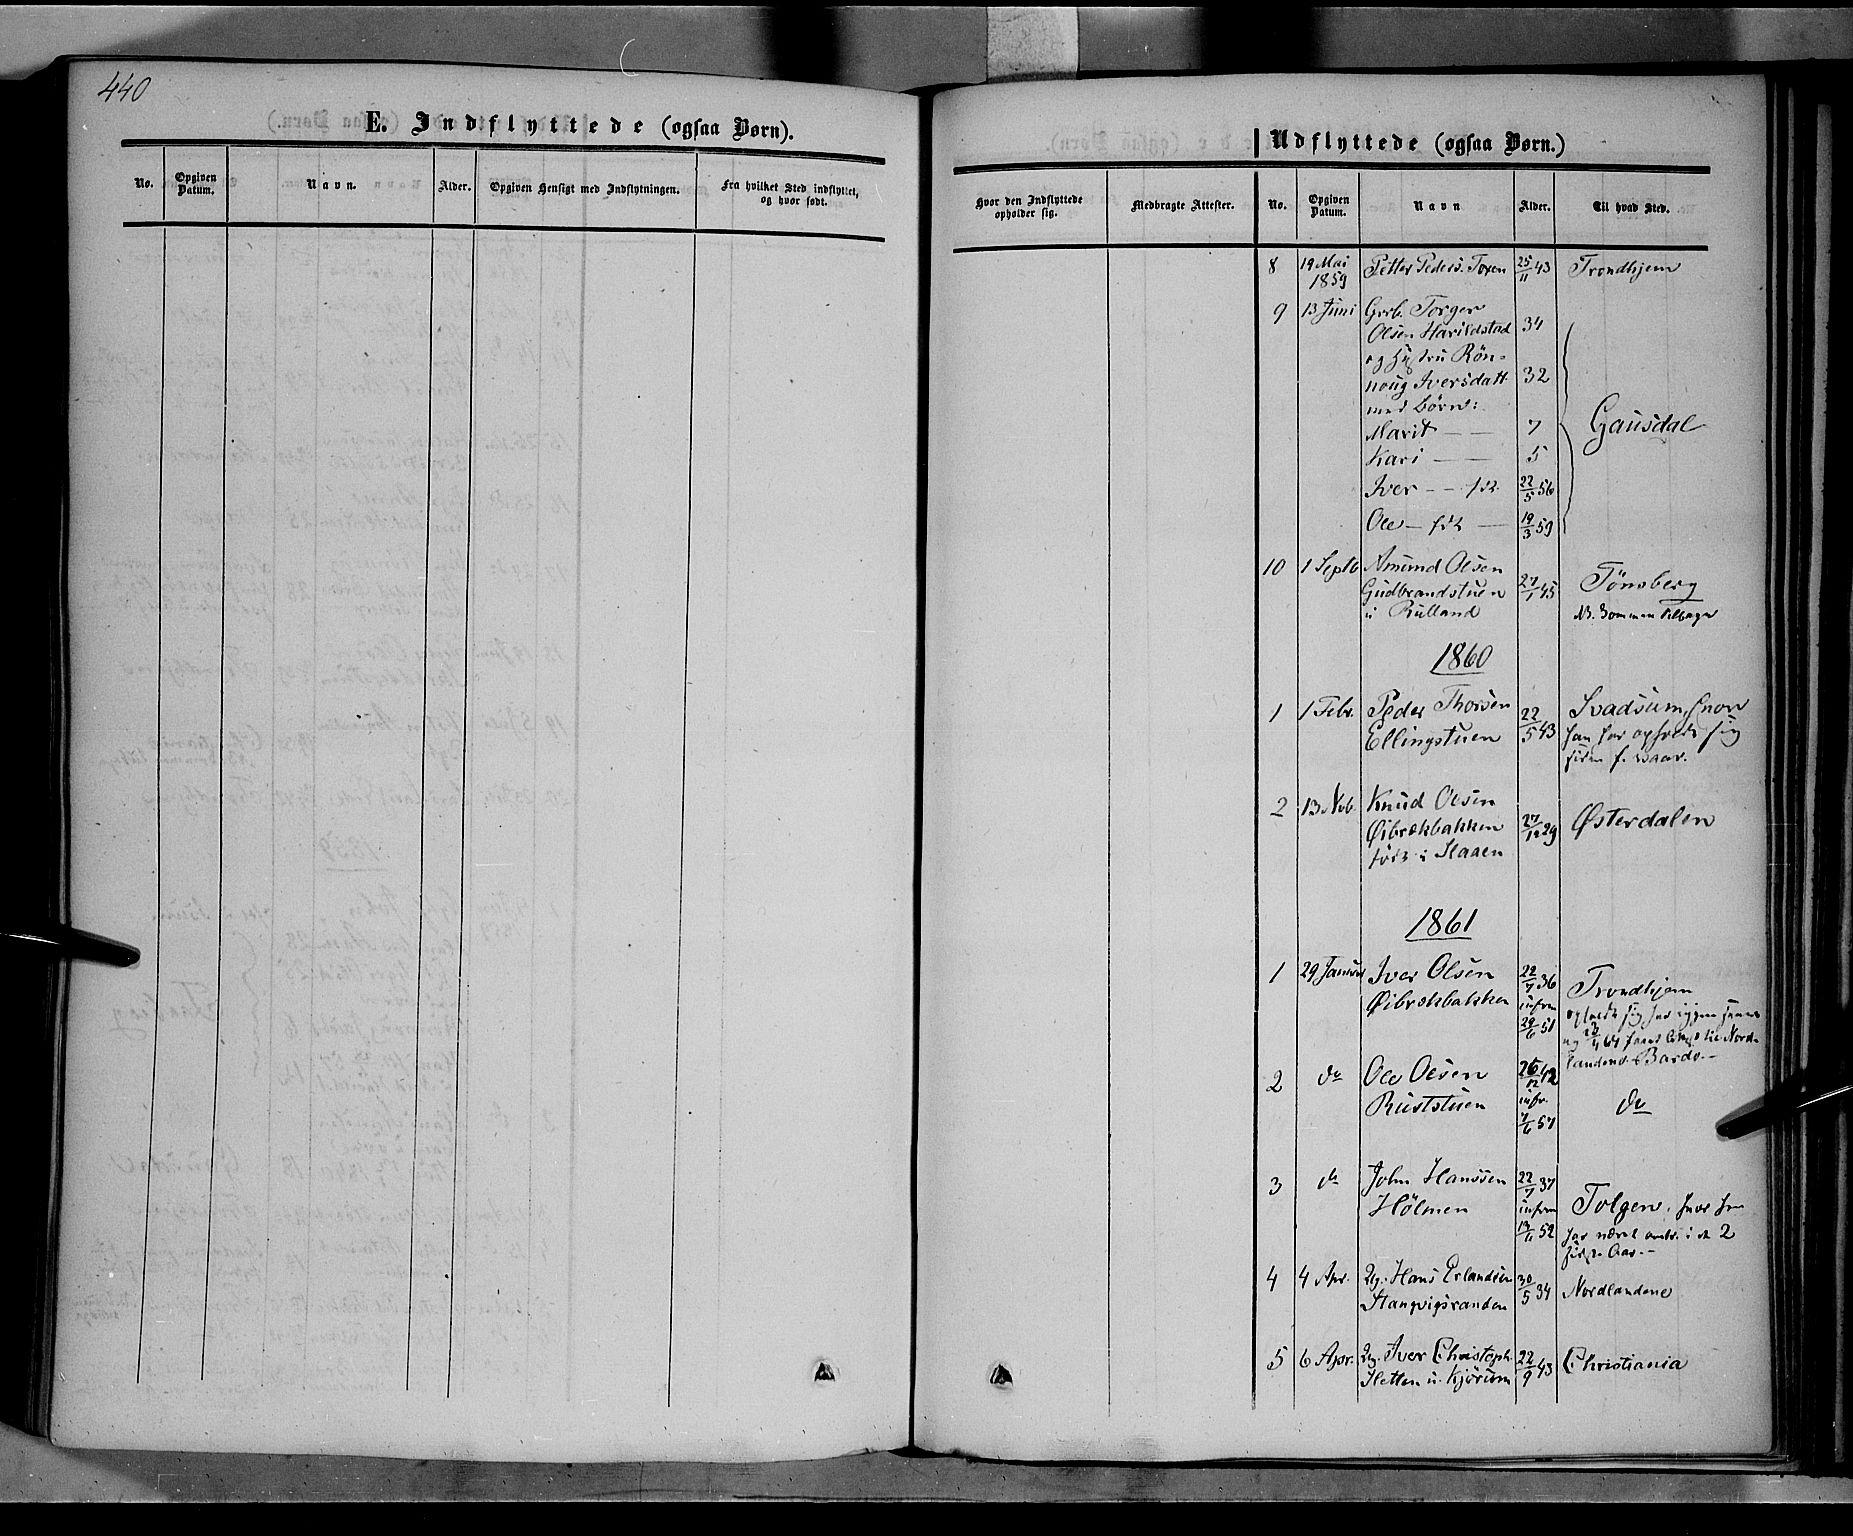 SAH, Nord-Fron prestekontor, Ministerialbok nr. 1, 1851-1864, s. 440